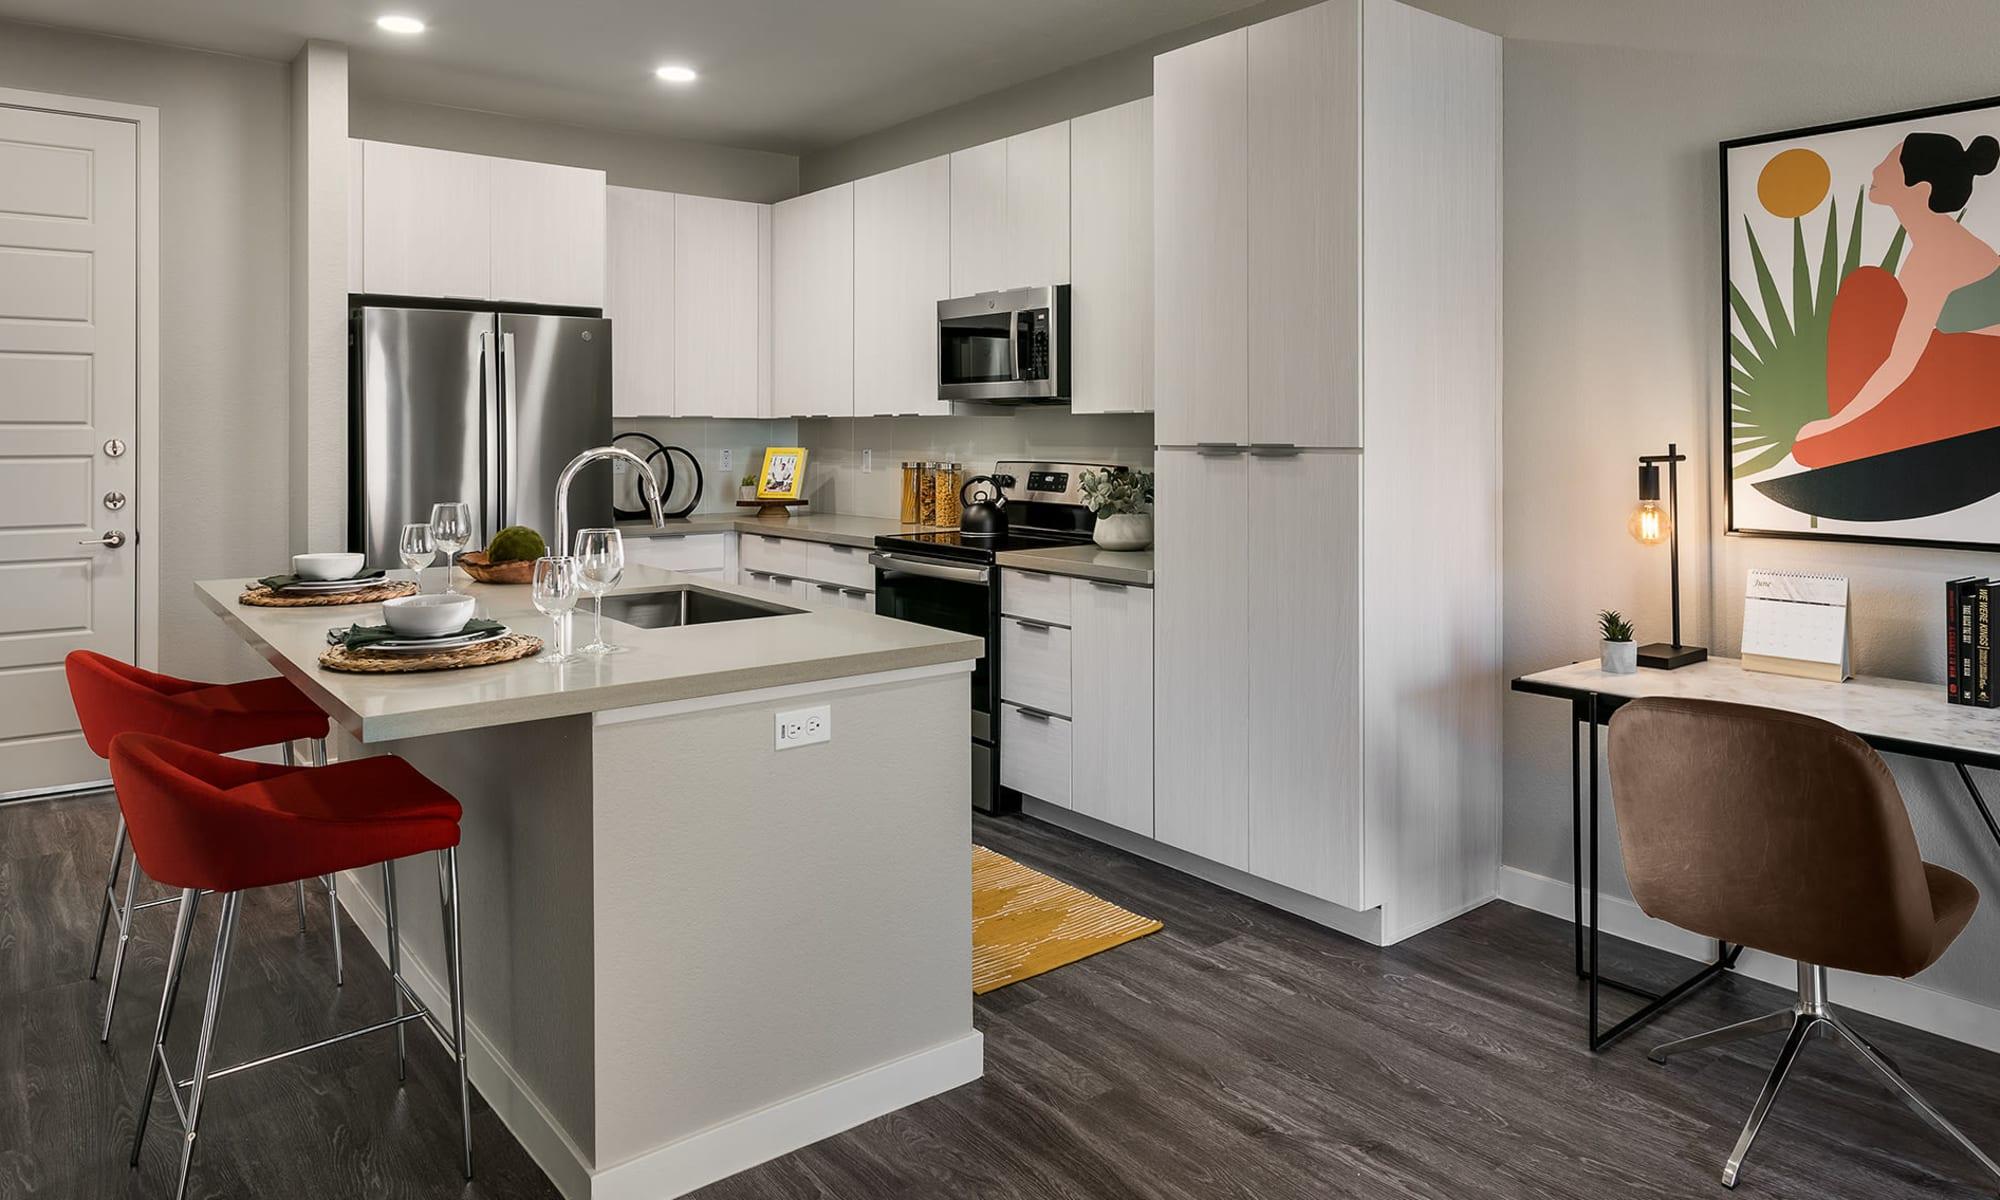 Apartments in Phoenix, Arizona at ArLo